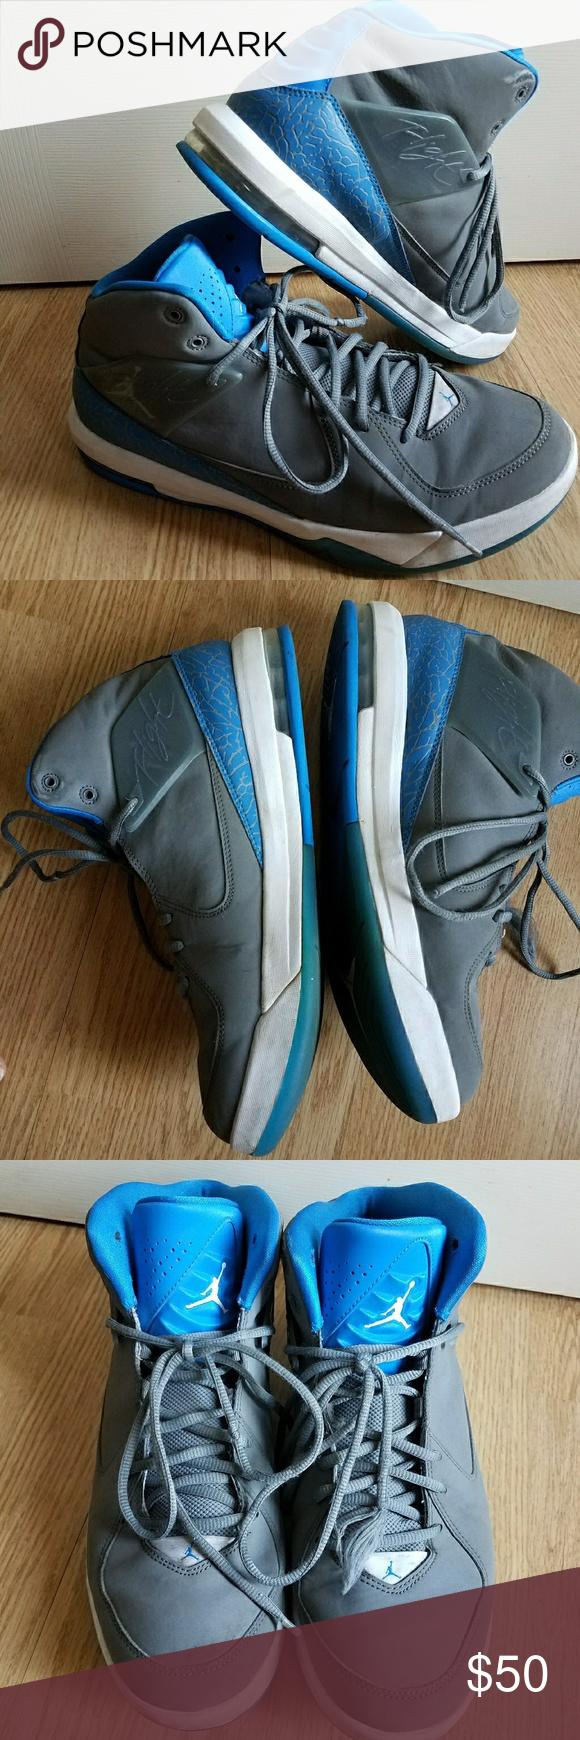 Air Jordan Flight Incline Basketball Shoes Air jordans